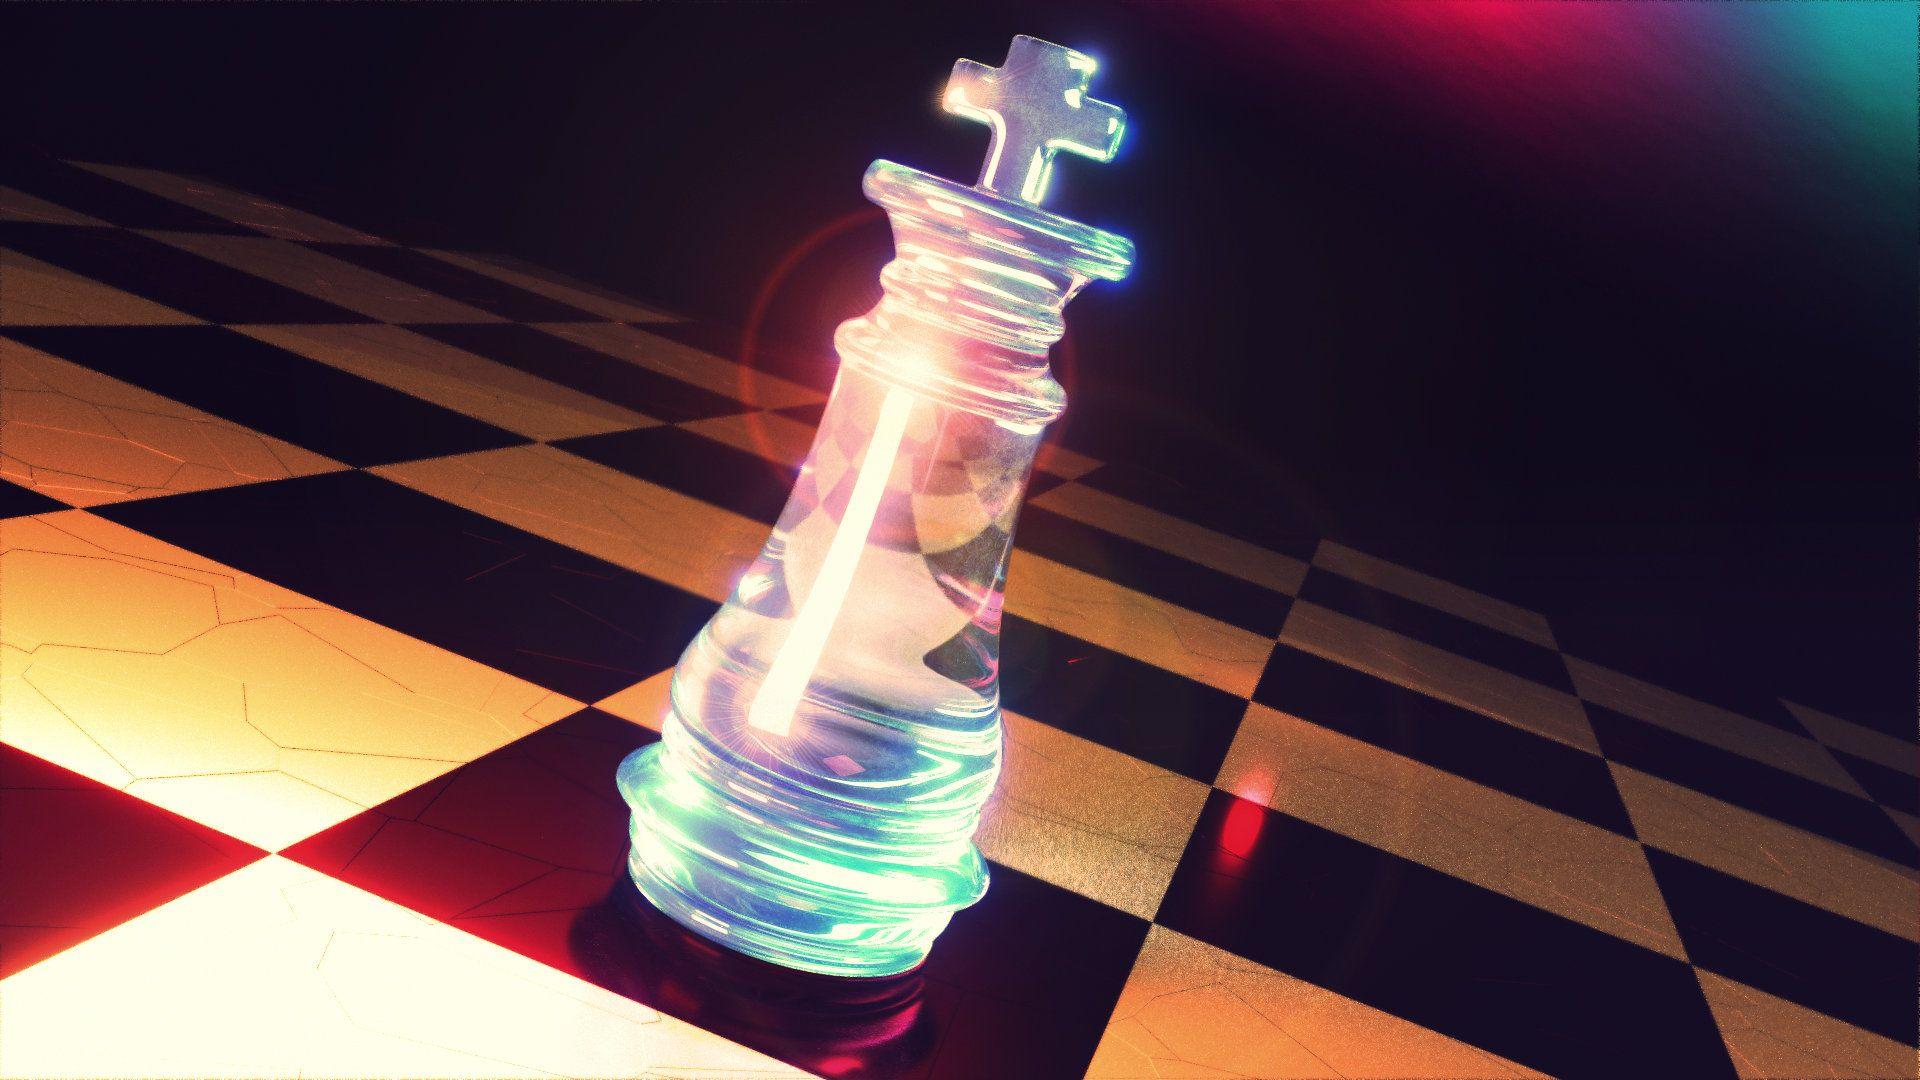 No Game No Life Chess Piece ライフ ノーゲームノーライフ 玻璃